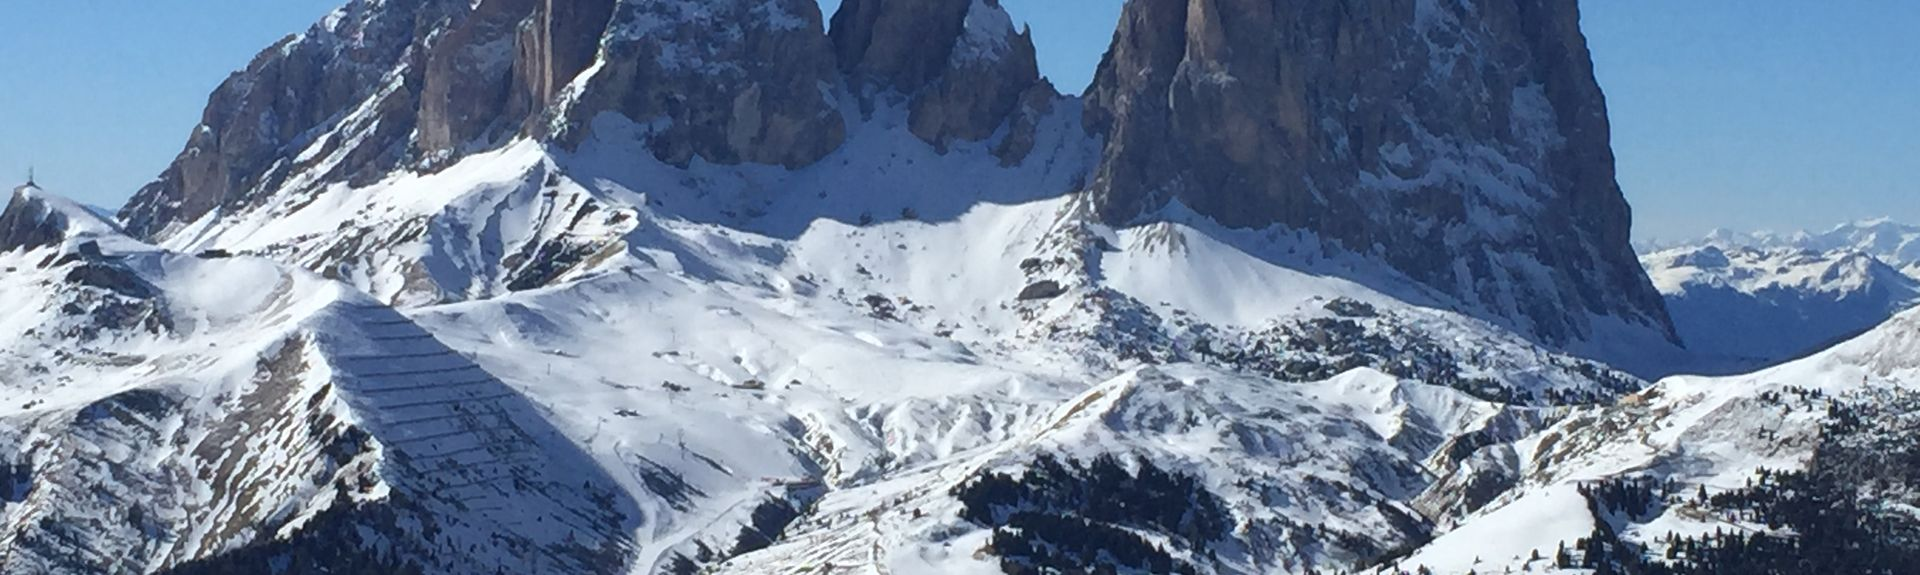 Cortina d'Ampezzo Ski Resort, Cortina d'Ampezzo, Italy